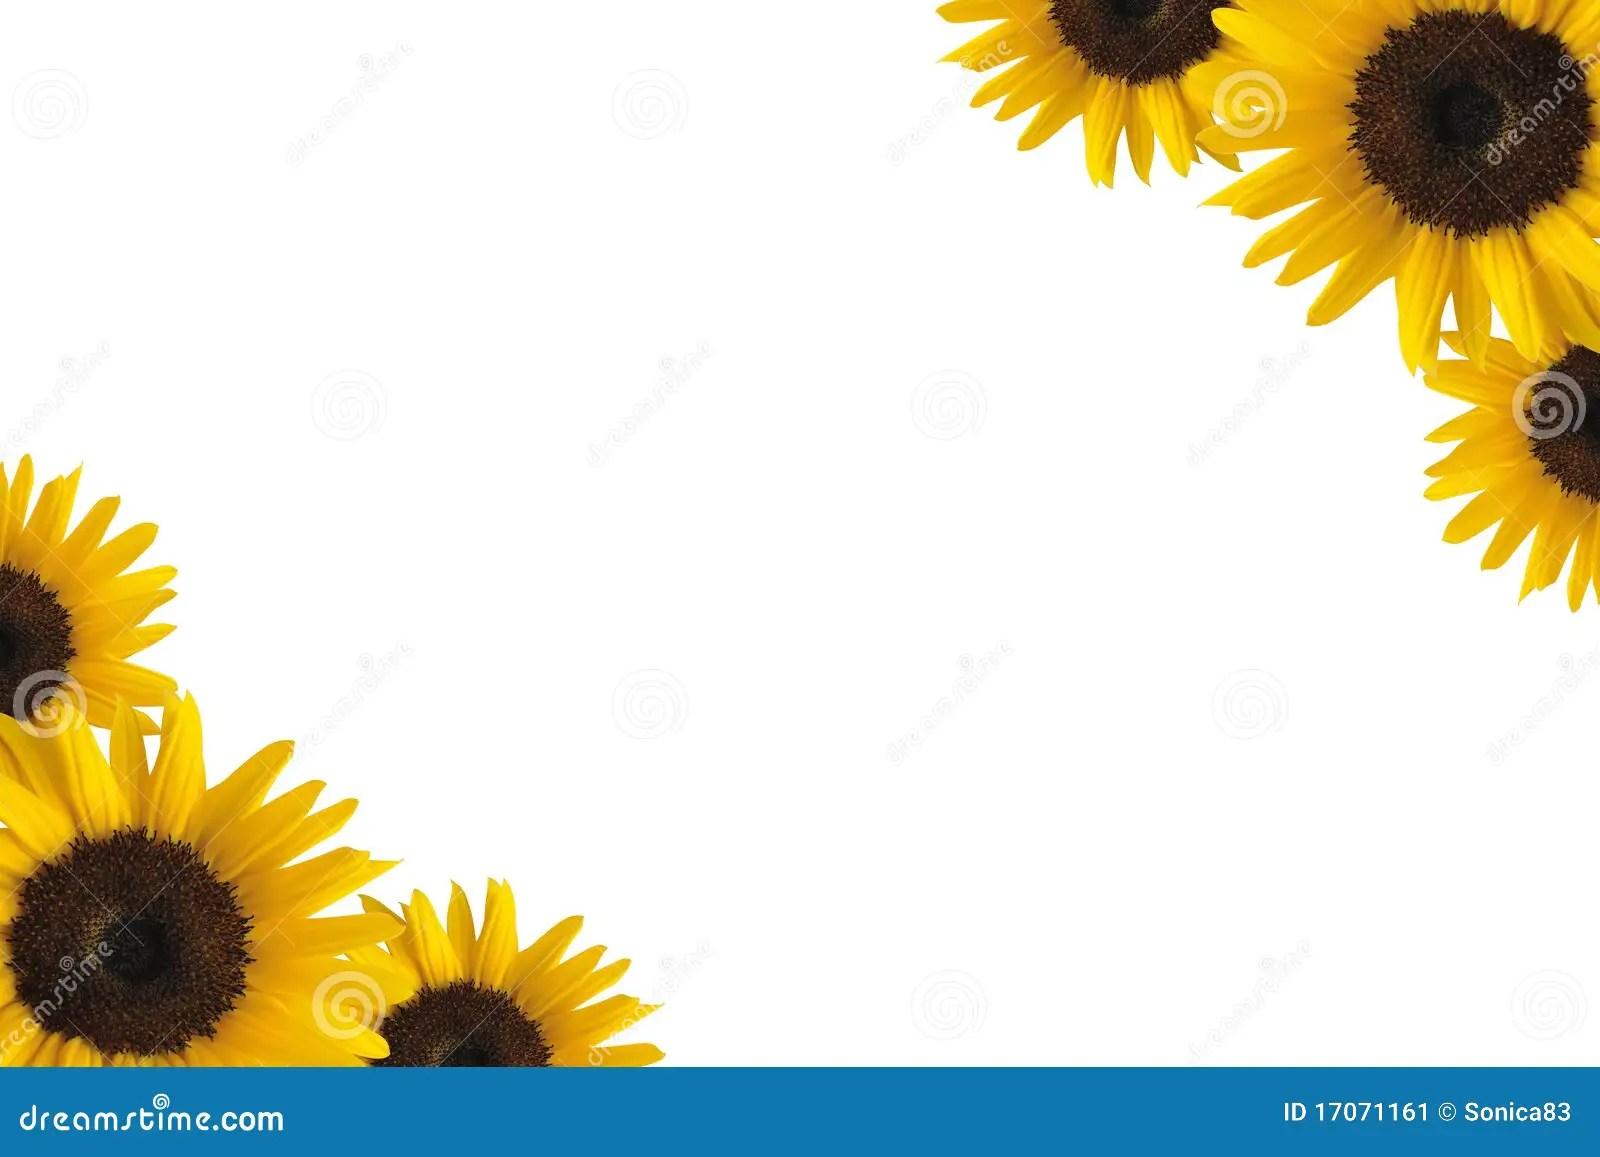 Fall Wooden Wallpaper Sunflower Border Stock Image Image Of Flora Beauty